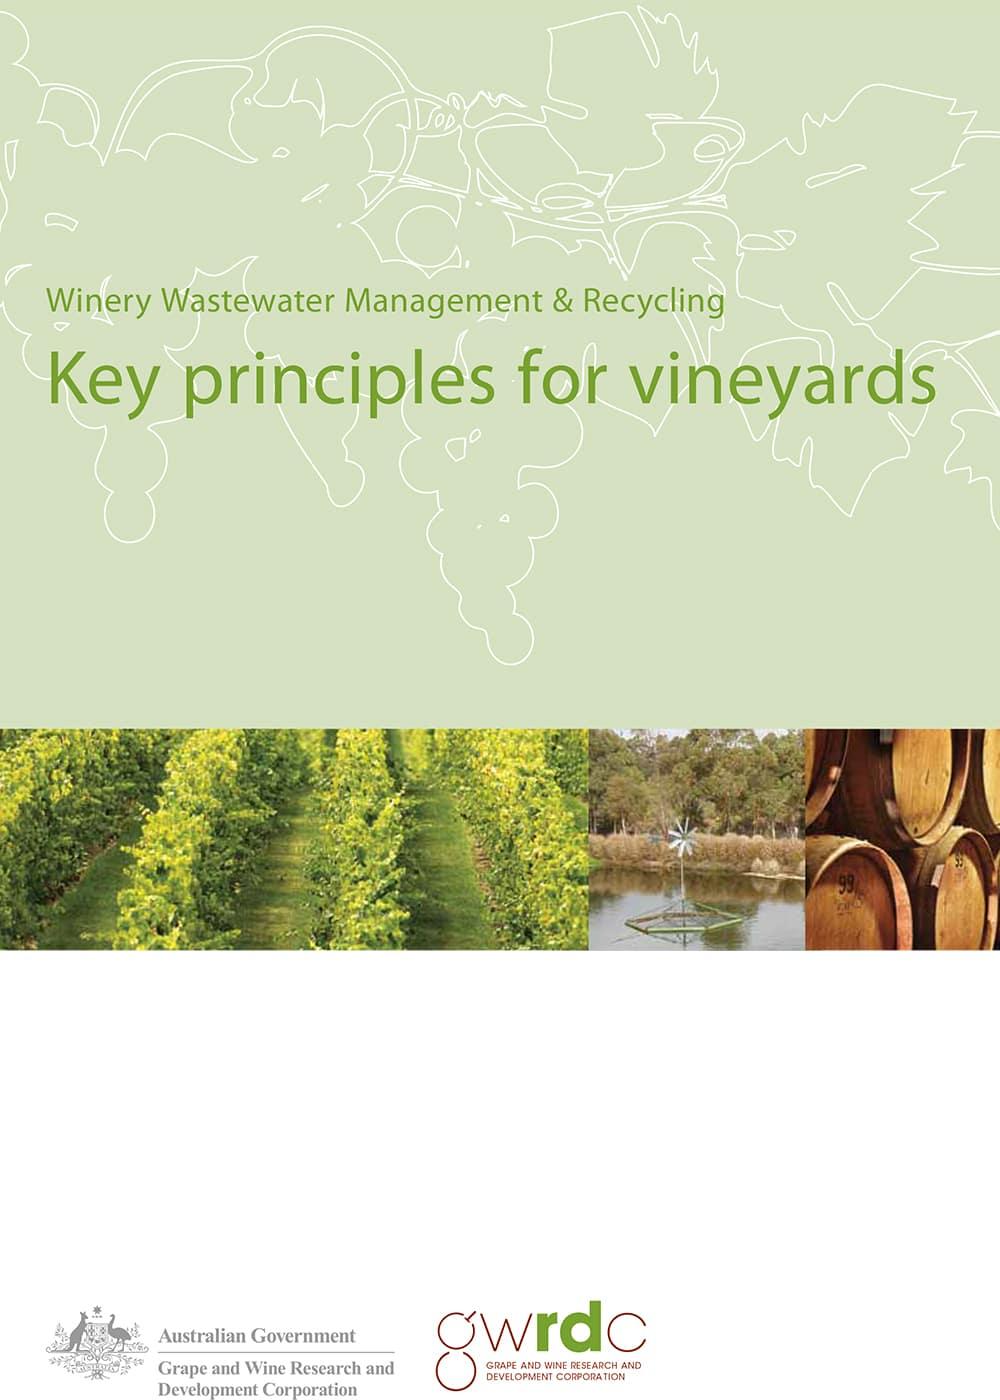 Key principles for vineyards